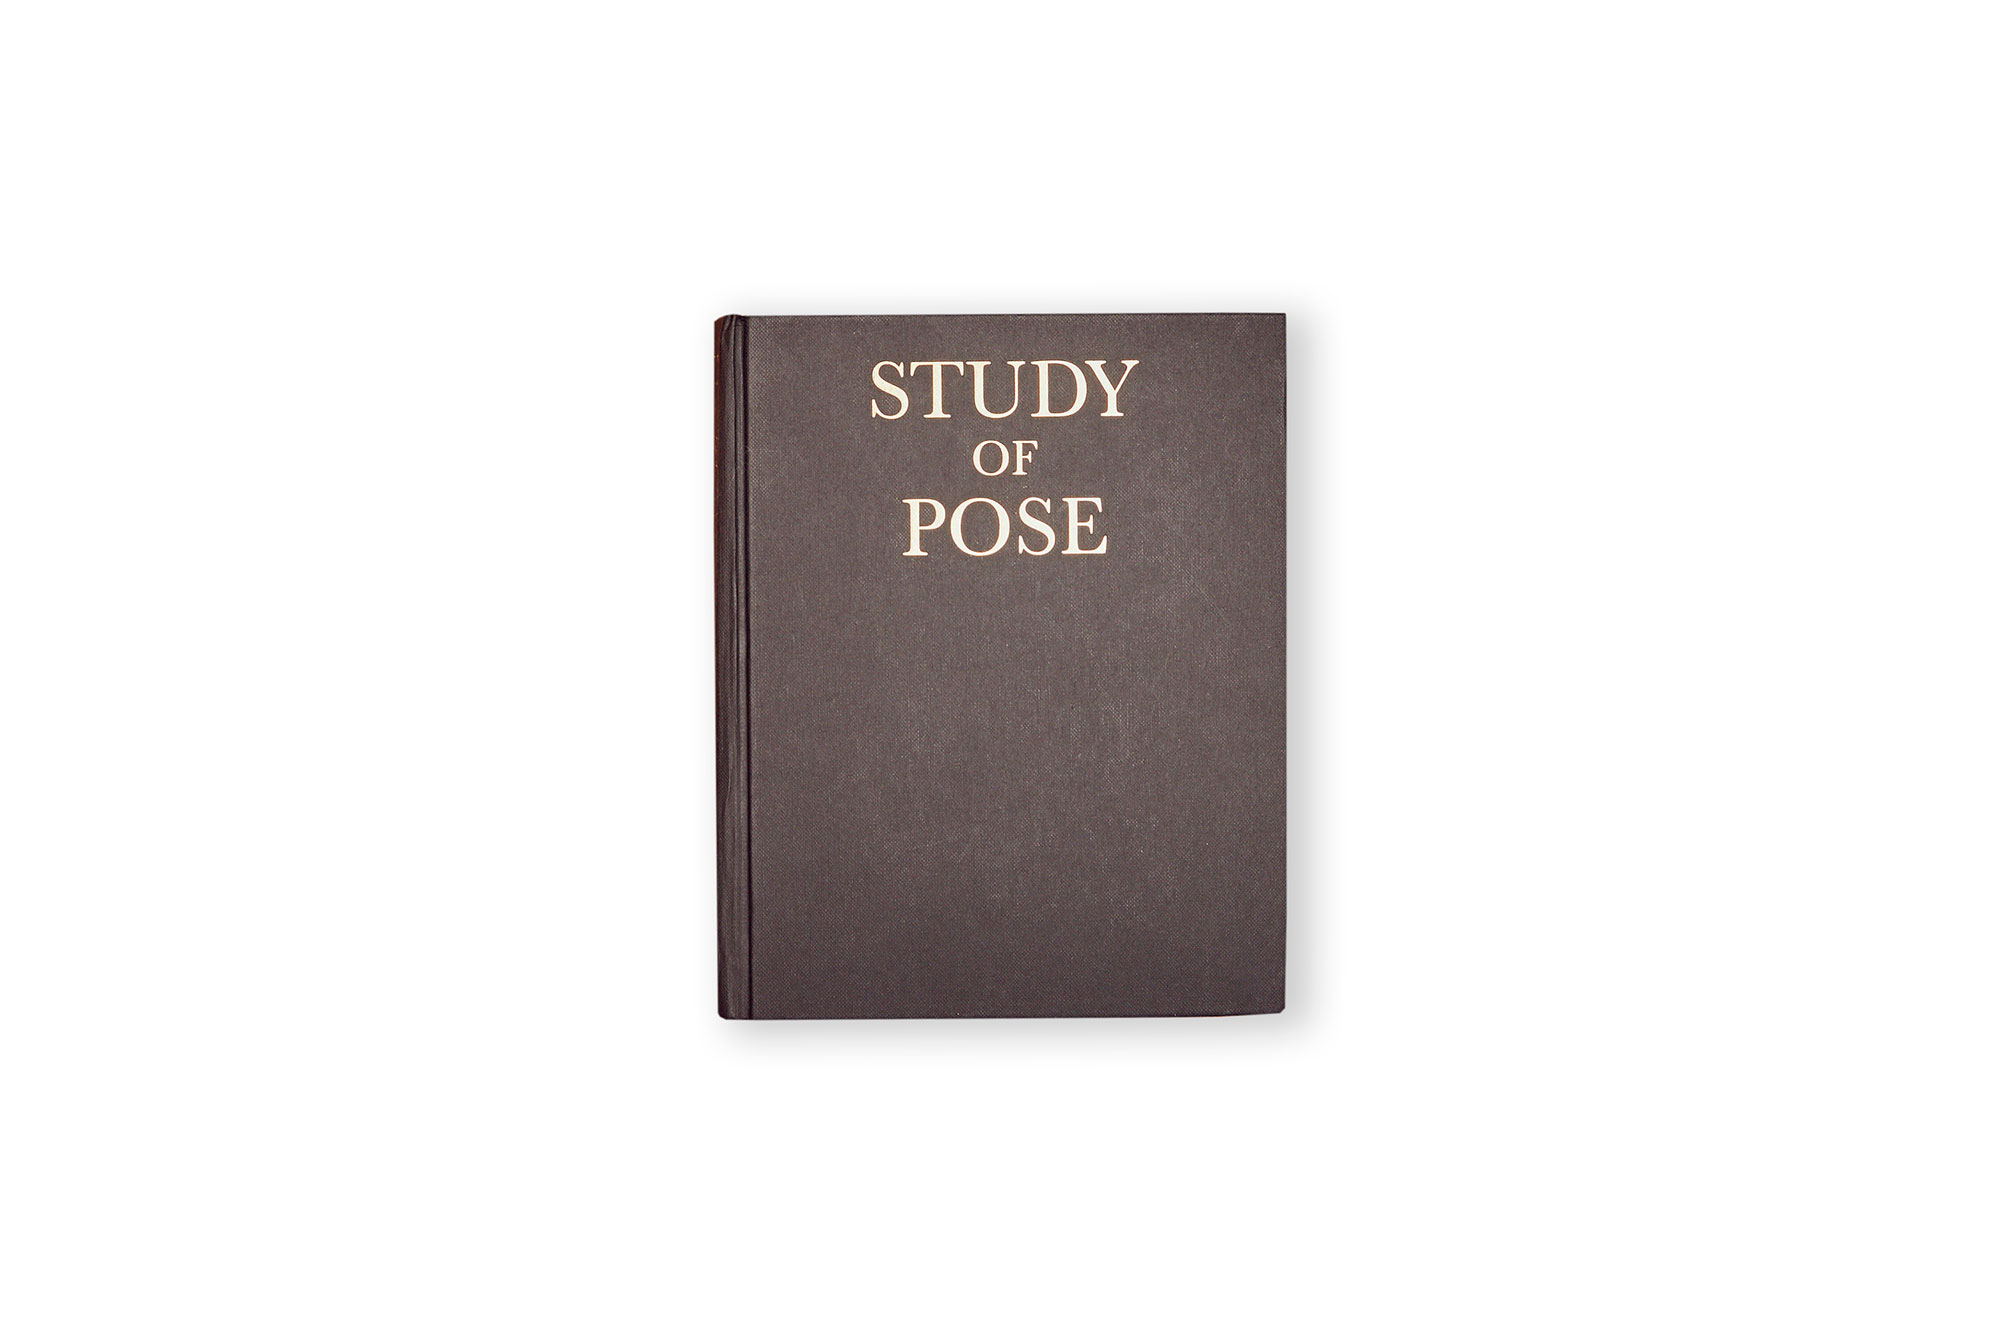 STUDY OF POSE.